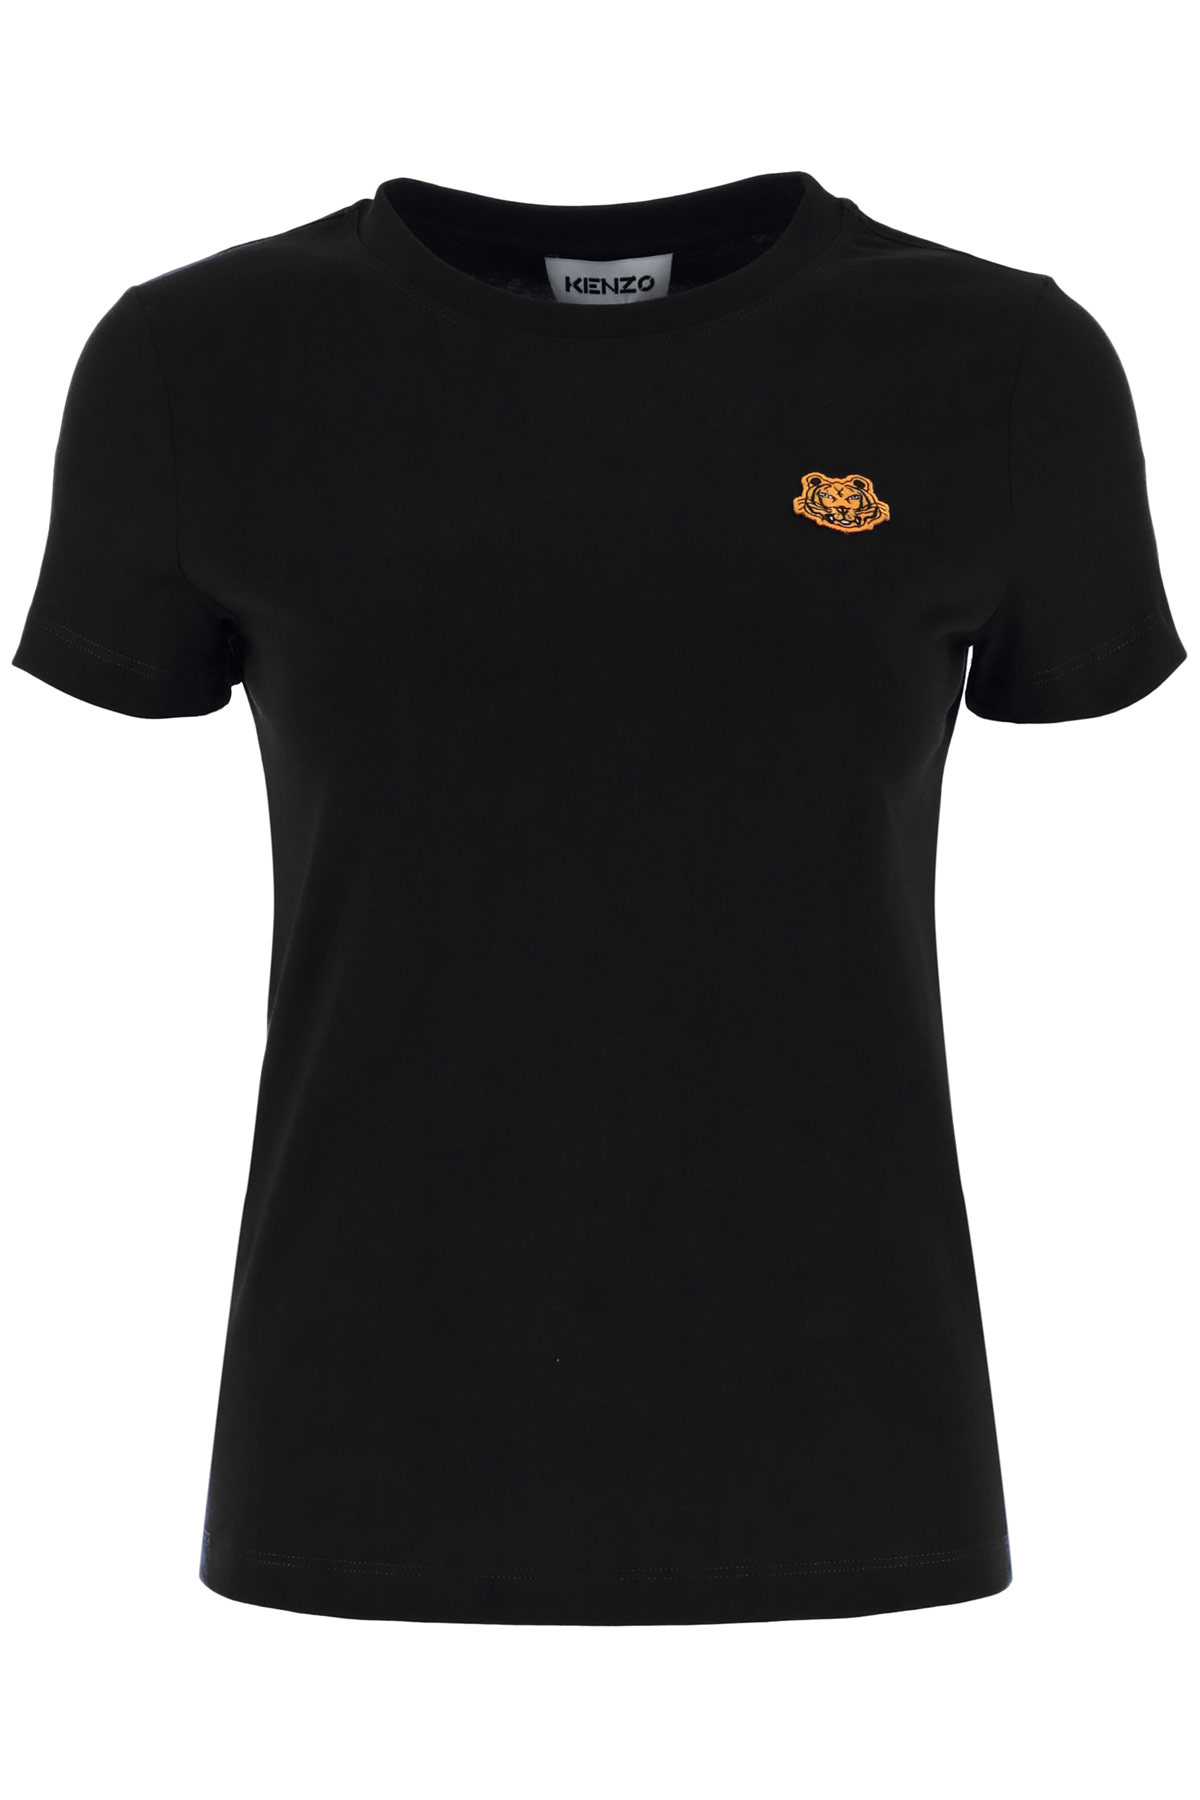 Kenzo t-shirt patch tiger